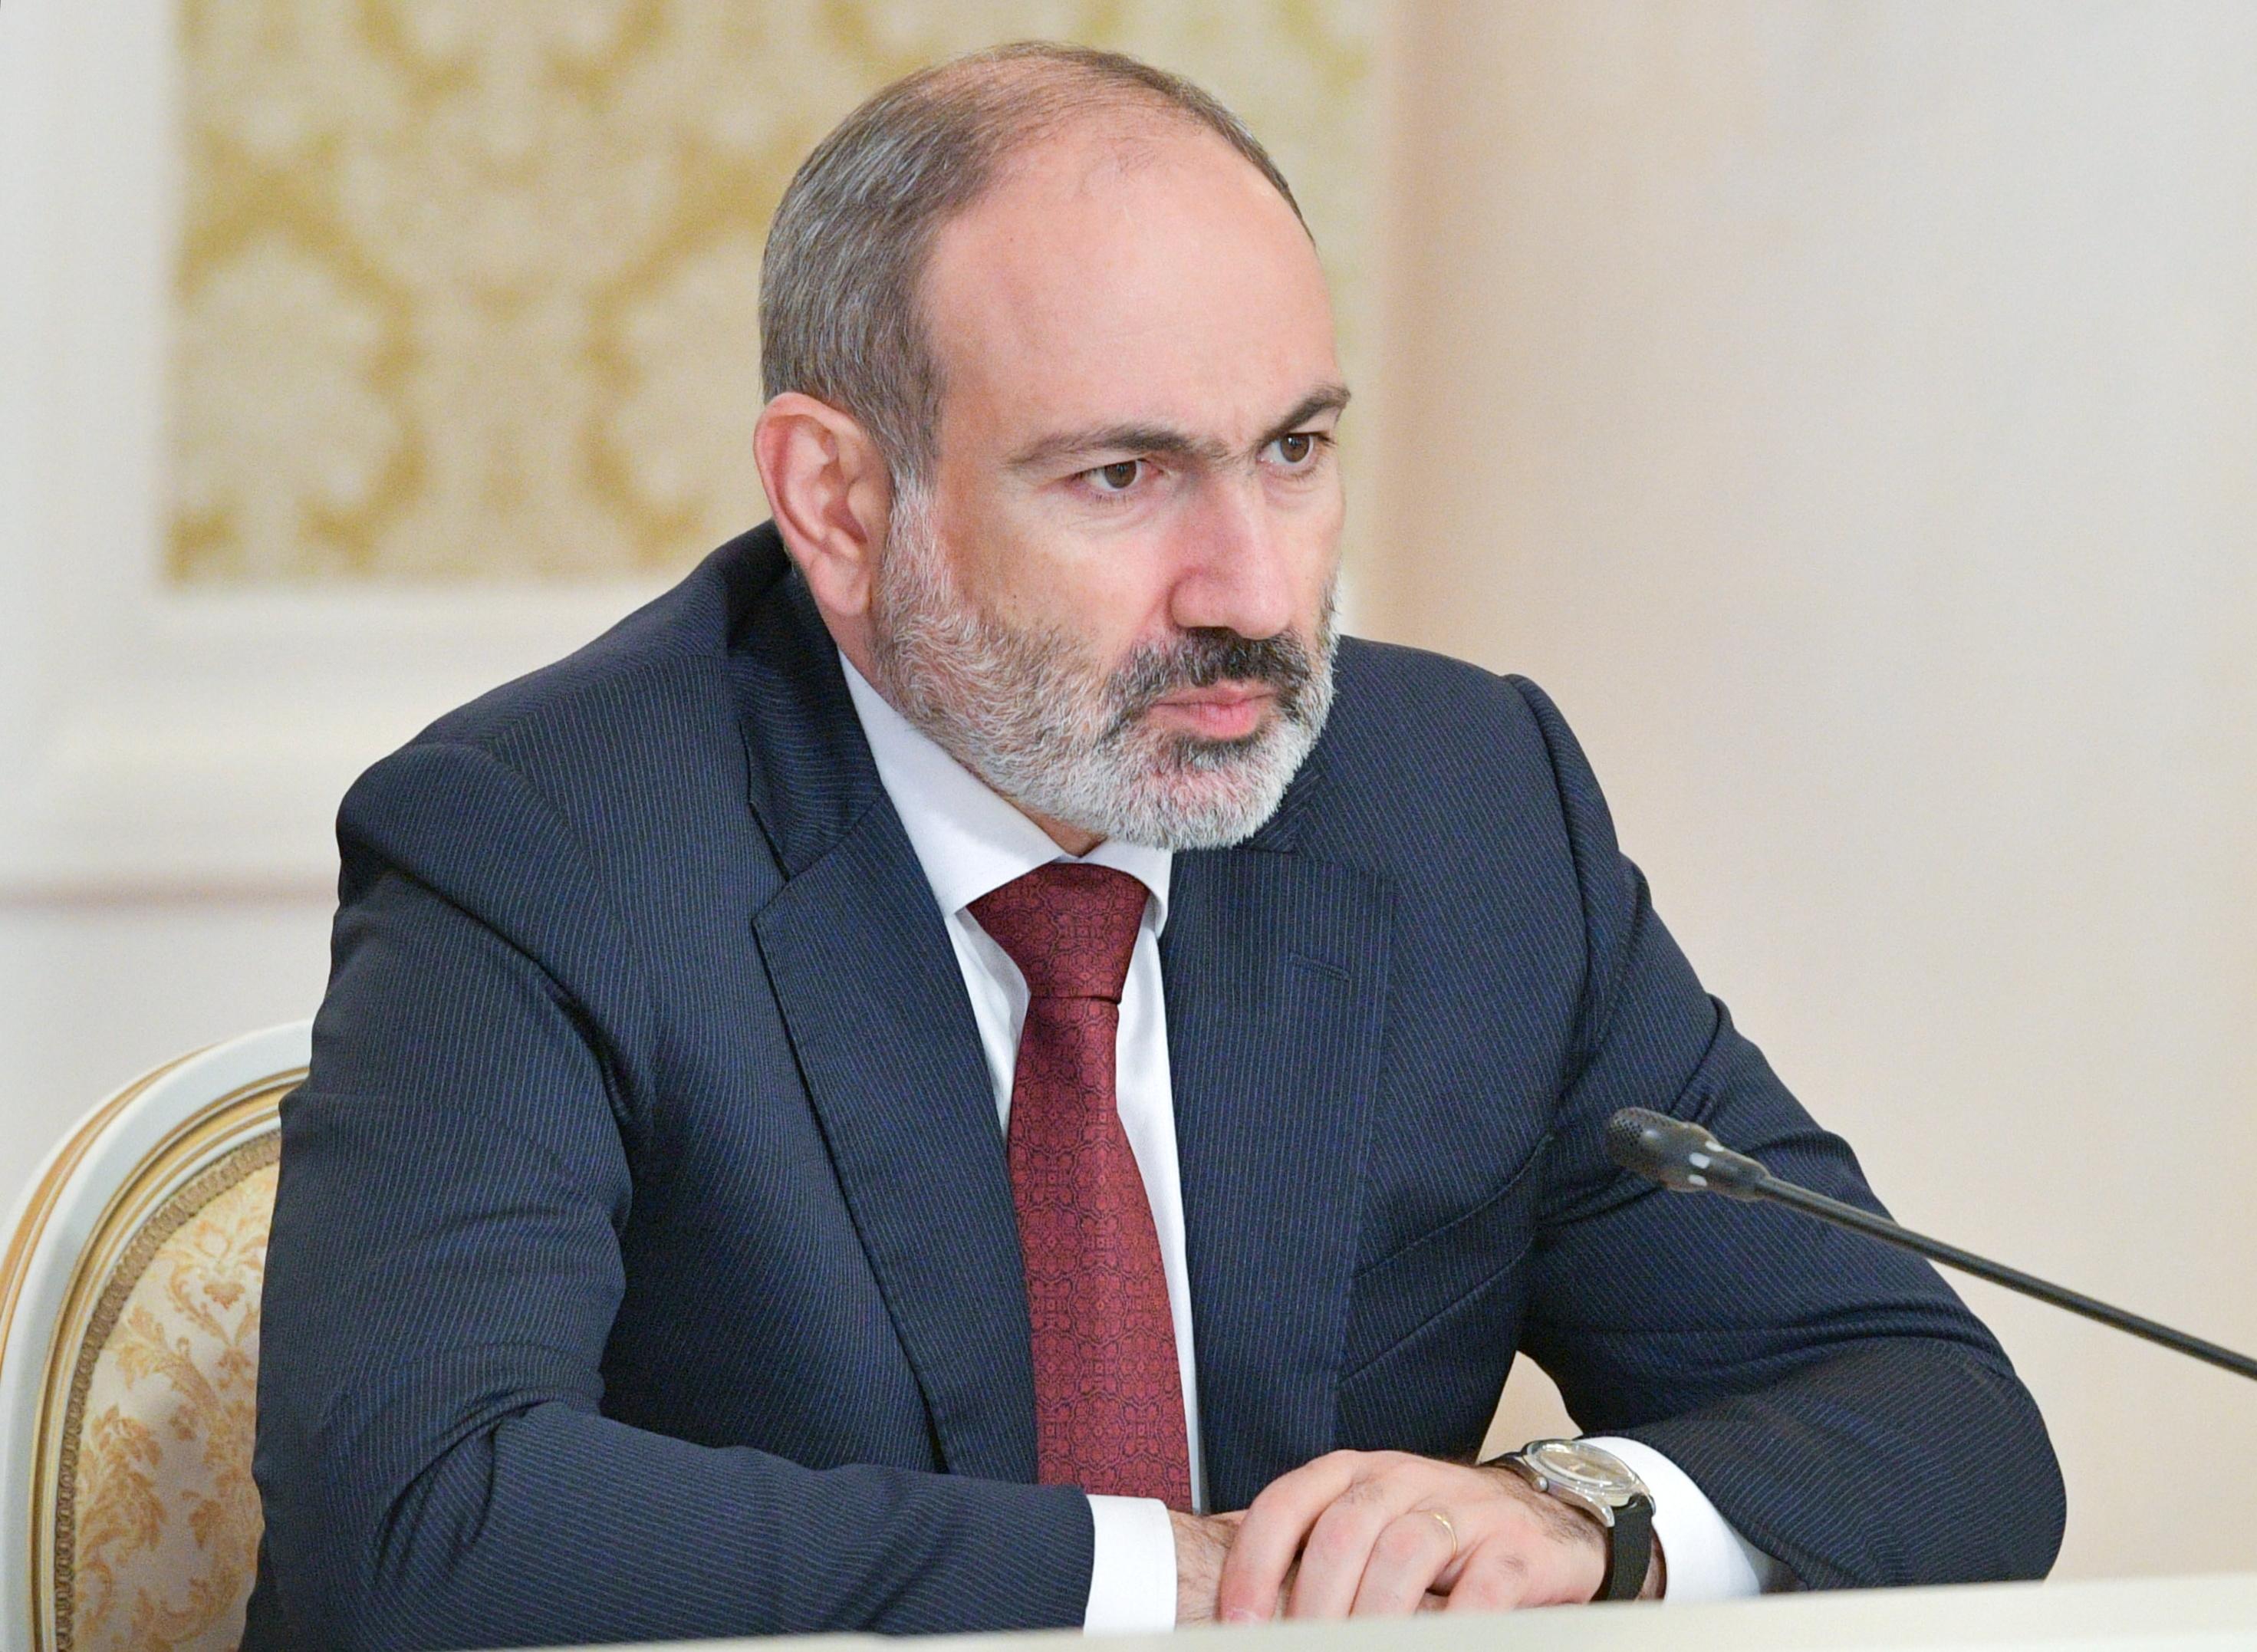 Armenia's acting Prime Minister Nikol Pashinyan attends a meeting in Kazan, Russia April 29, 2021. Sputnik/Alexander Astafyev/Pool via REUTERS